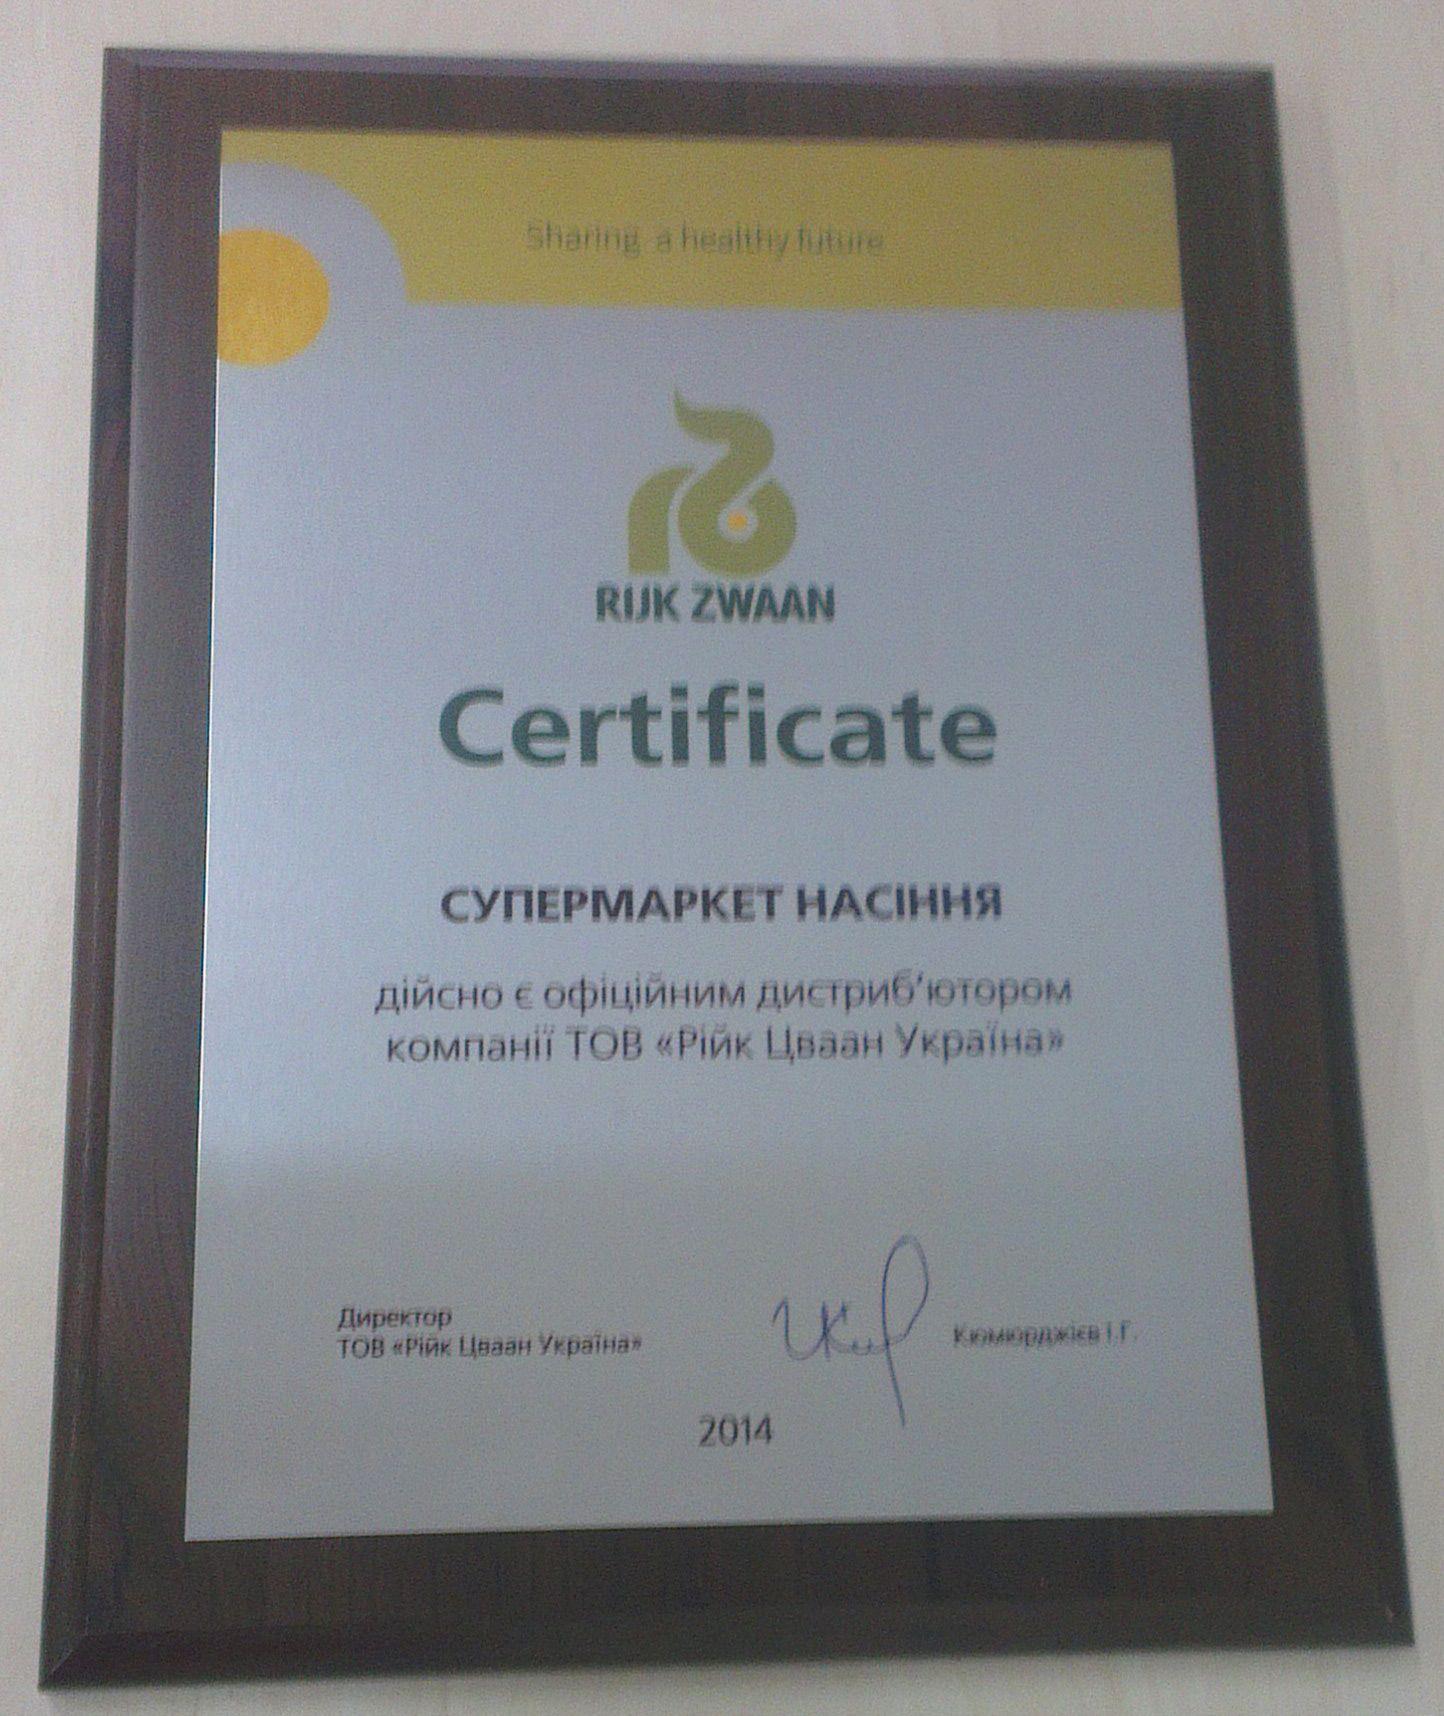 Сертификат Rijk Zwaan